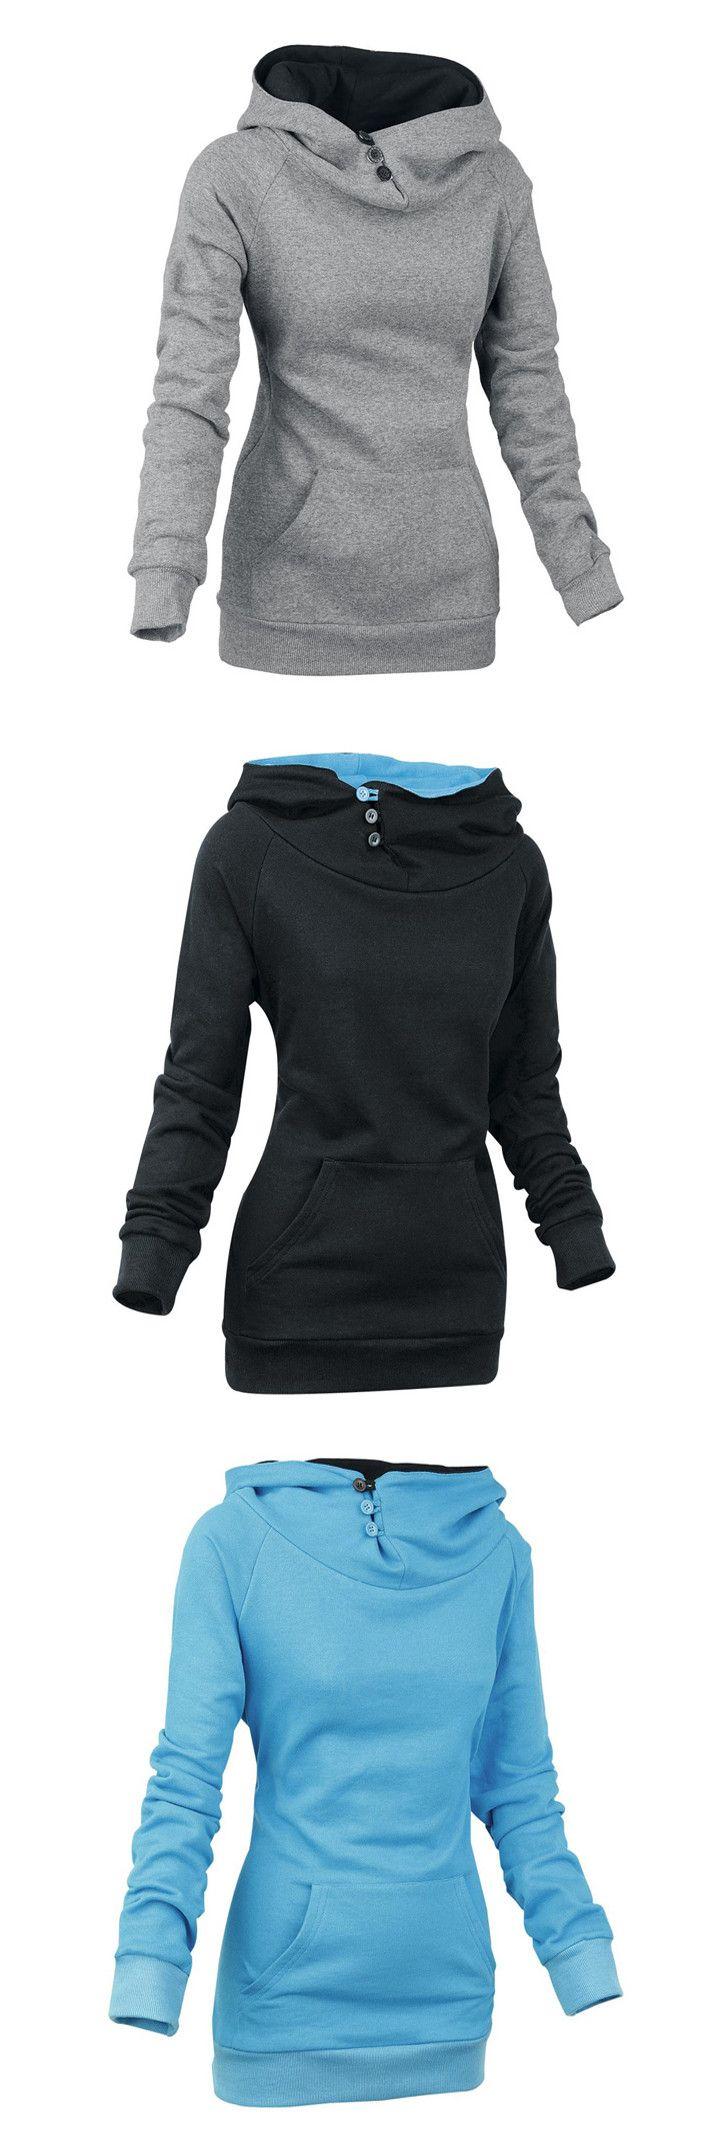 Love these! Hoodies  gray & black & blue